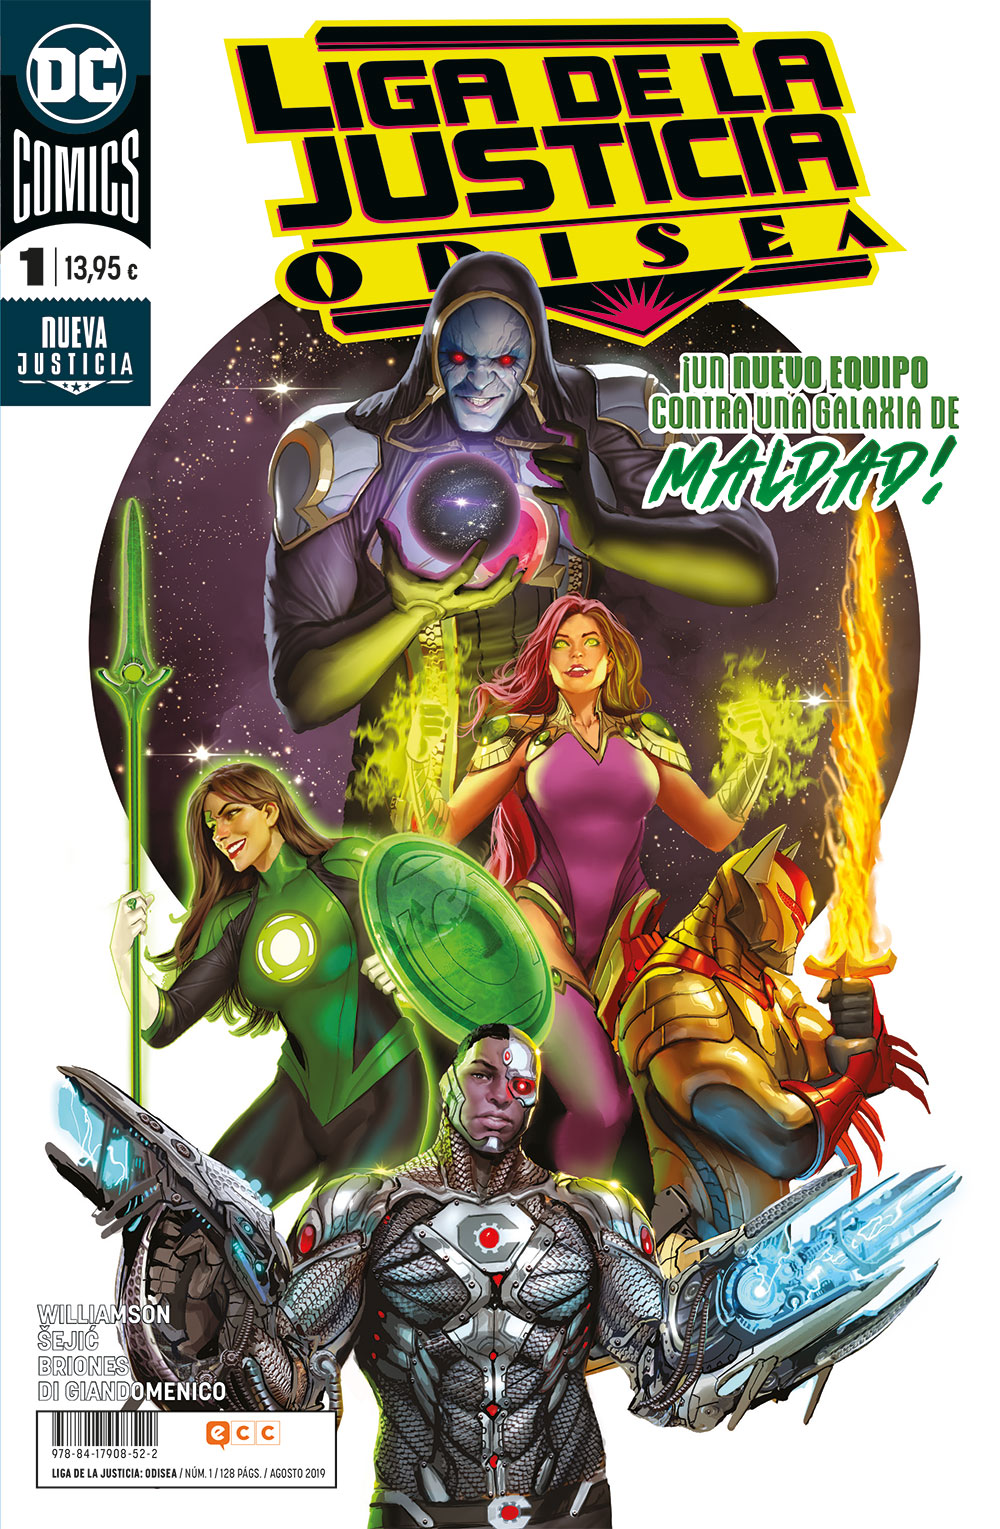 Liga de la Justicia: Odisea #1